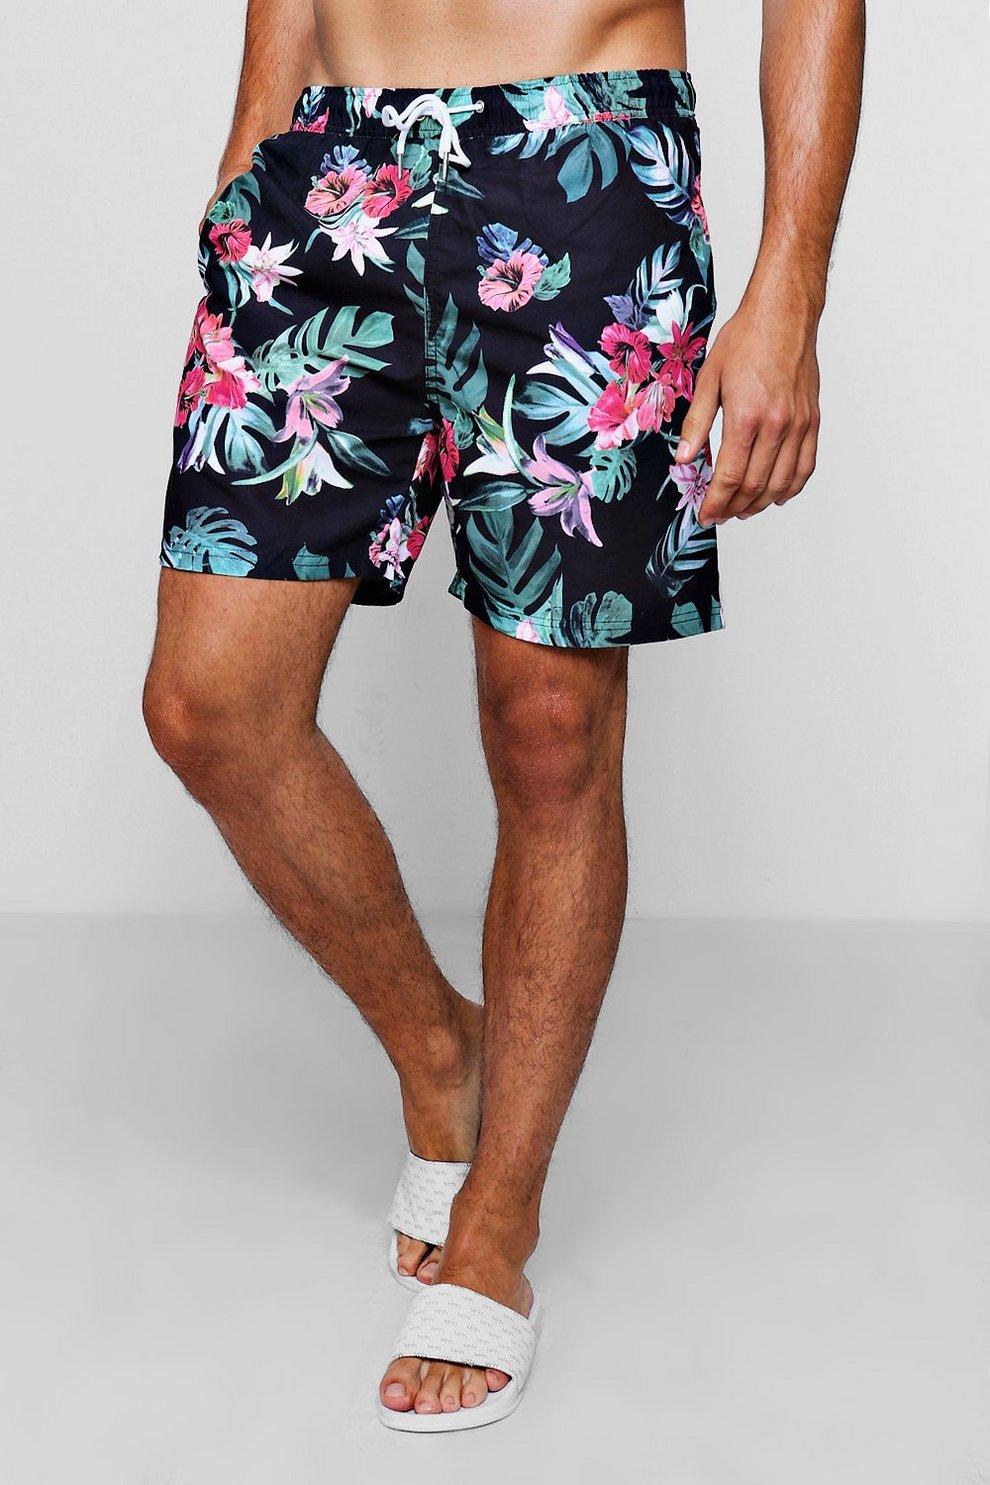 903c8d4cd2767 Mens Black Floral Print Swim Shorts